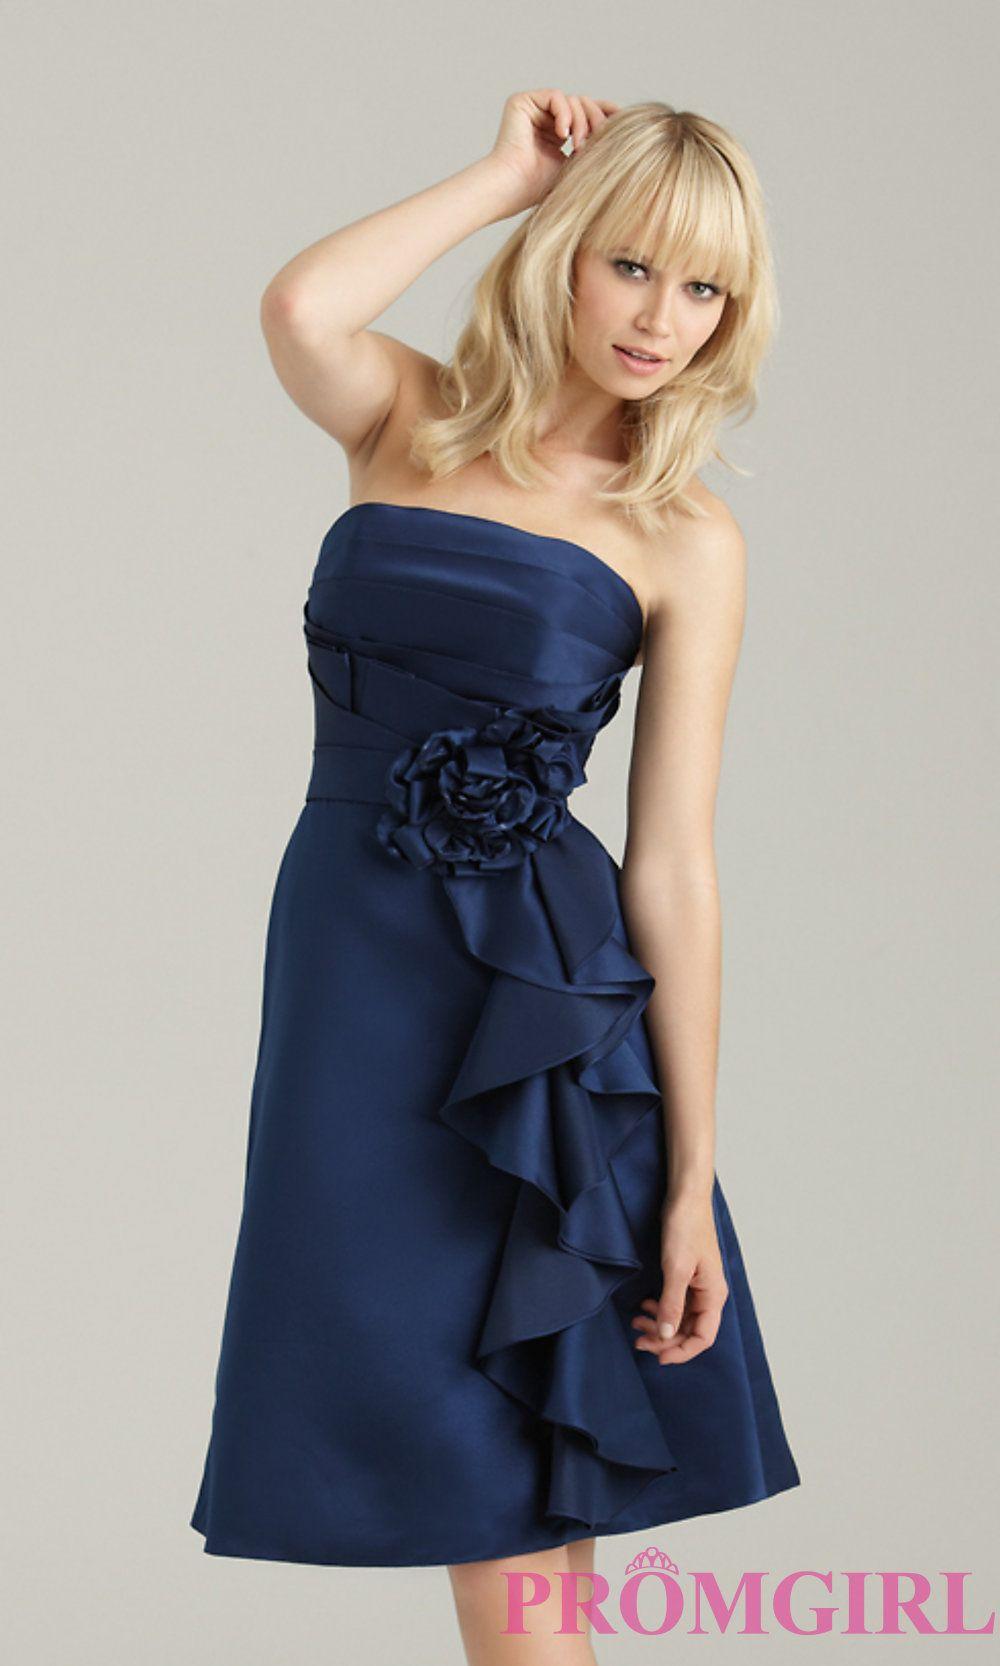 Short Strapless Ruffled Bridesmaid DressNM-1335  923e5b10824